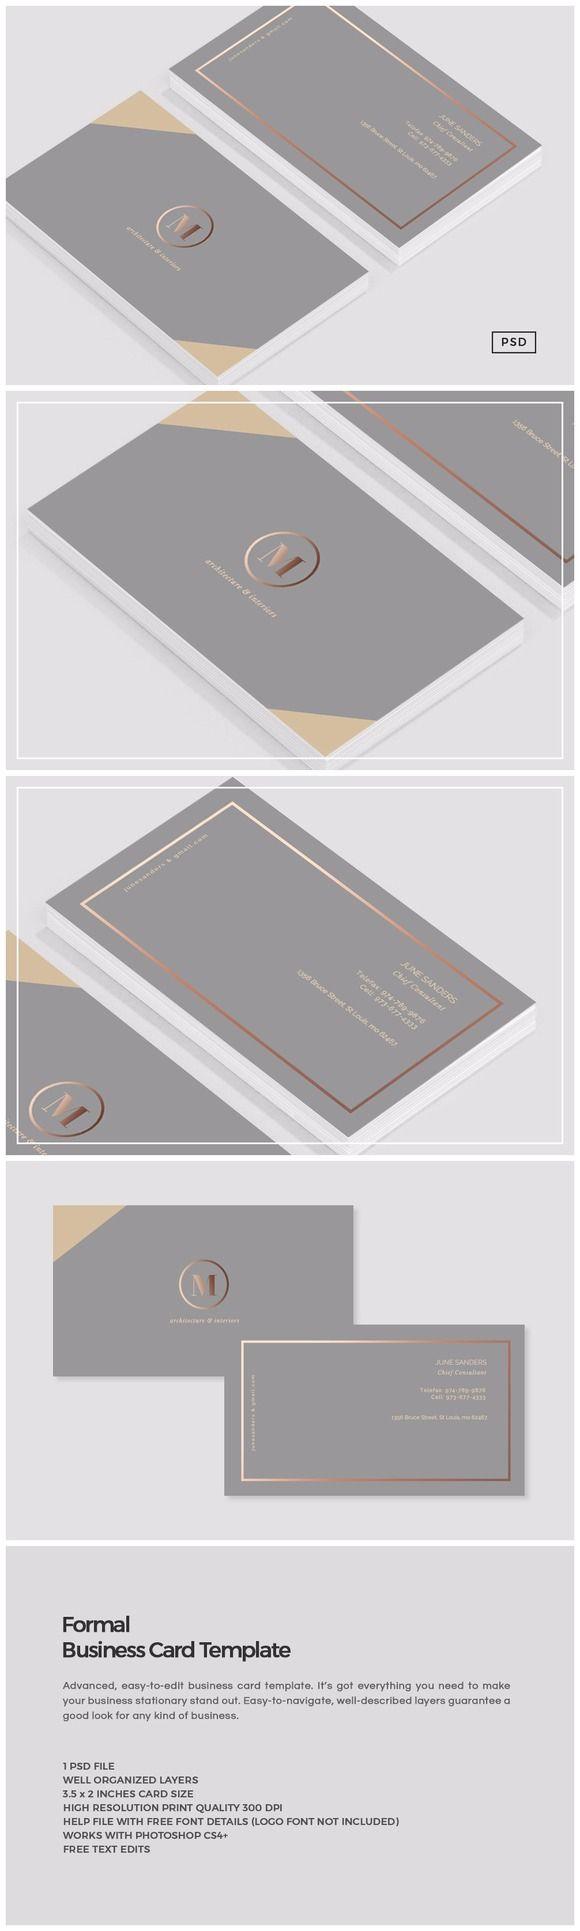 Formal Business Card Template https://creativemarket.com/MeeraG/837522-Formal-Business-Card-Template #design #art #graphicdesign